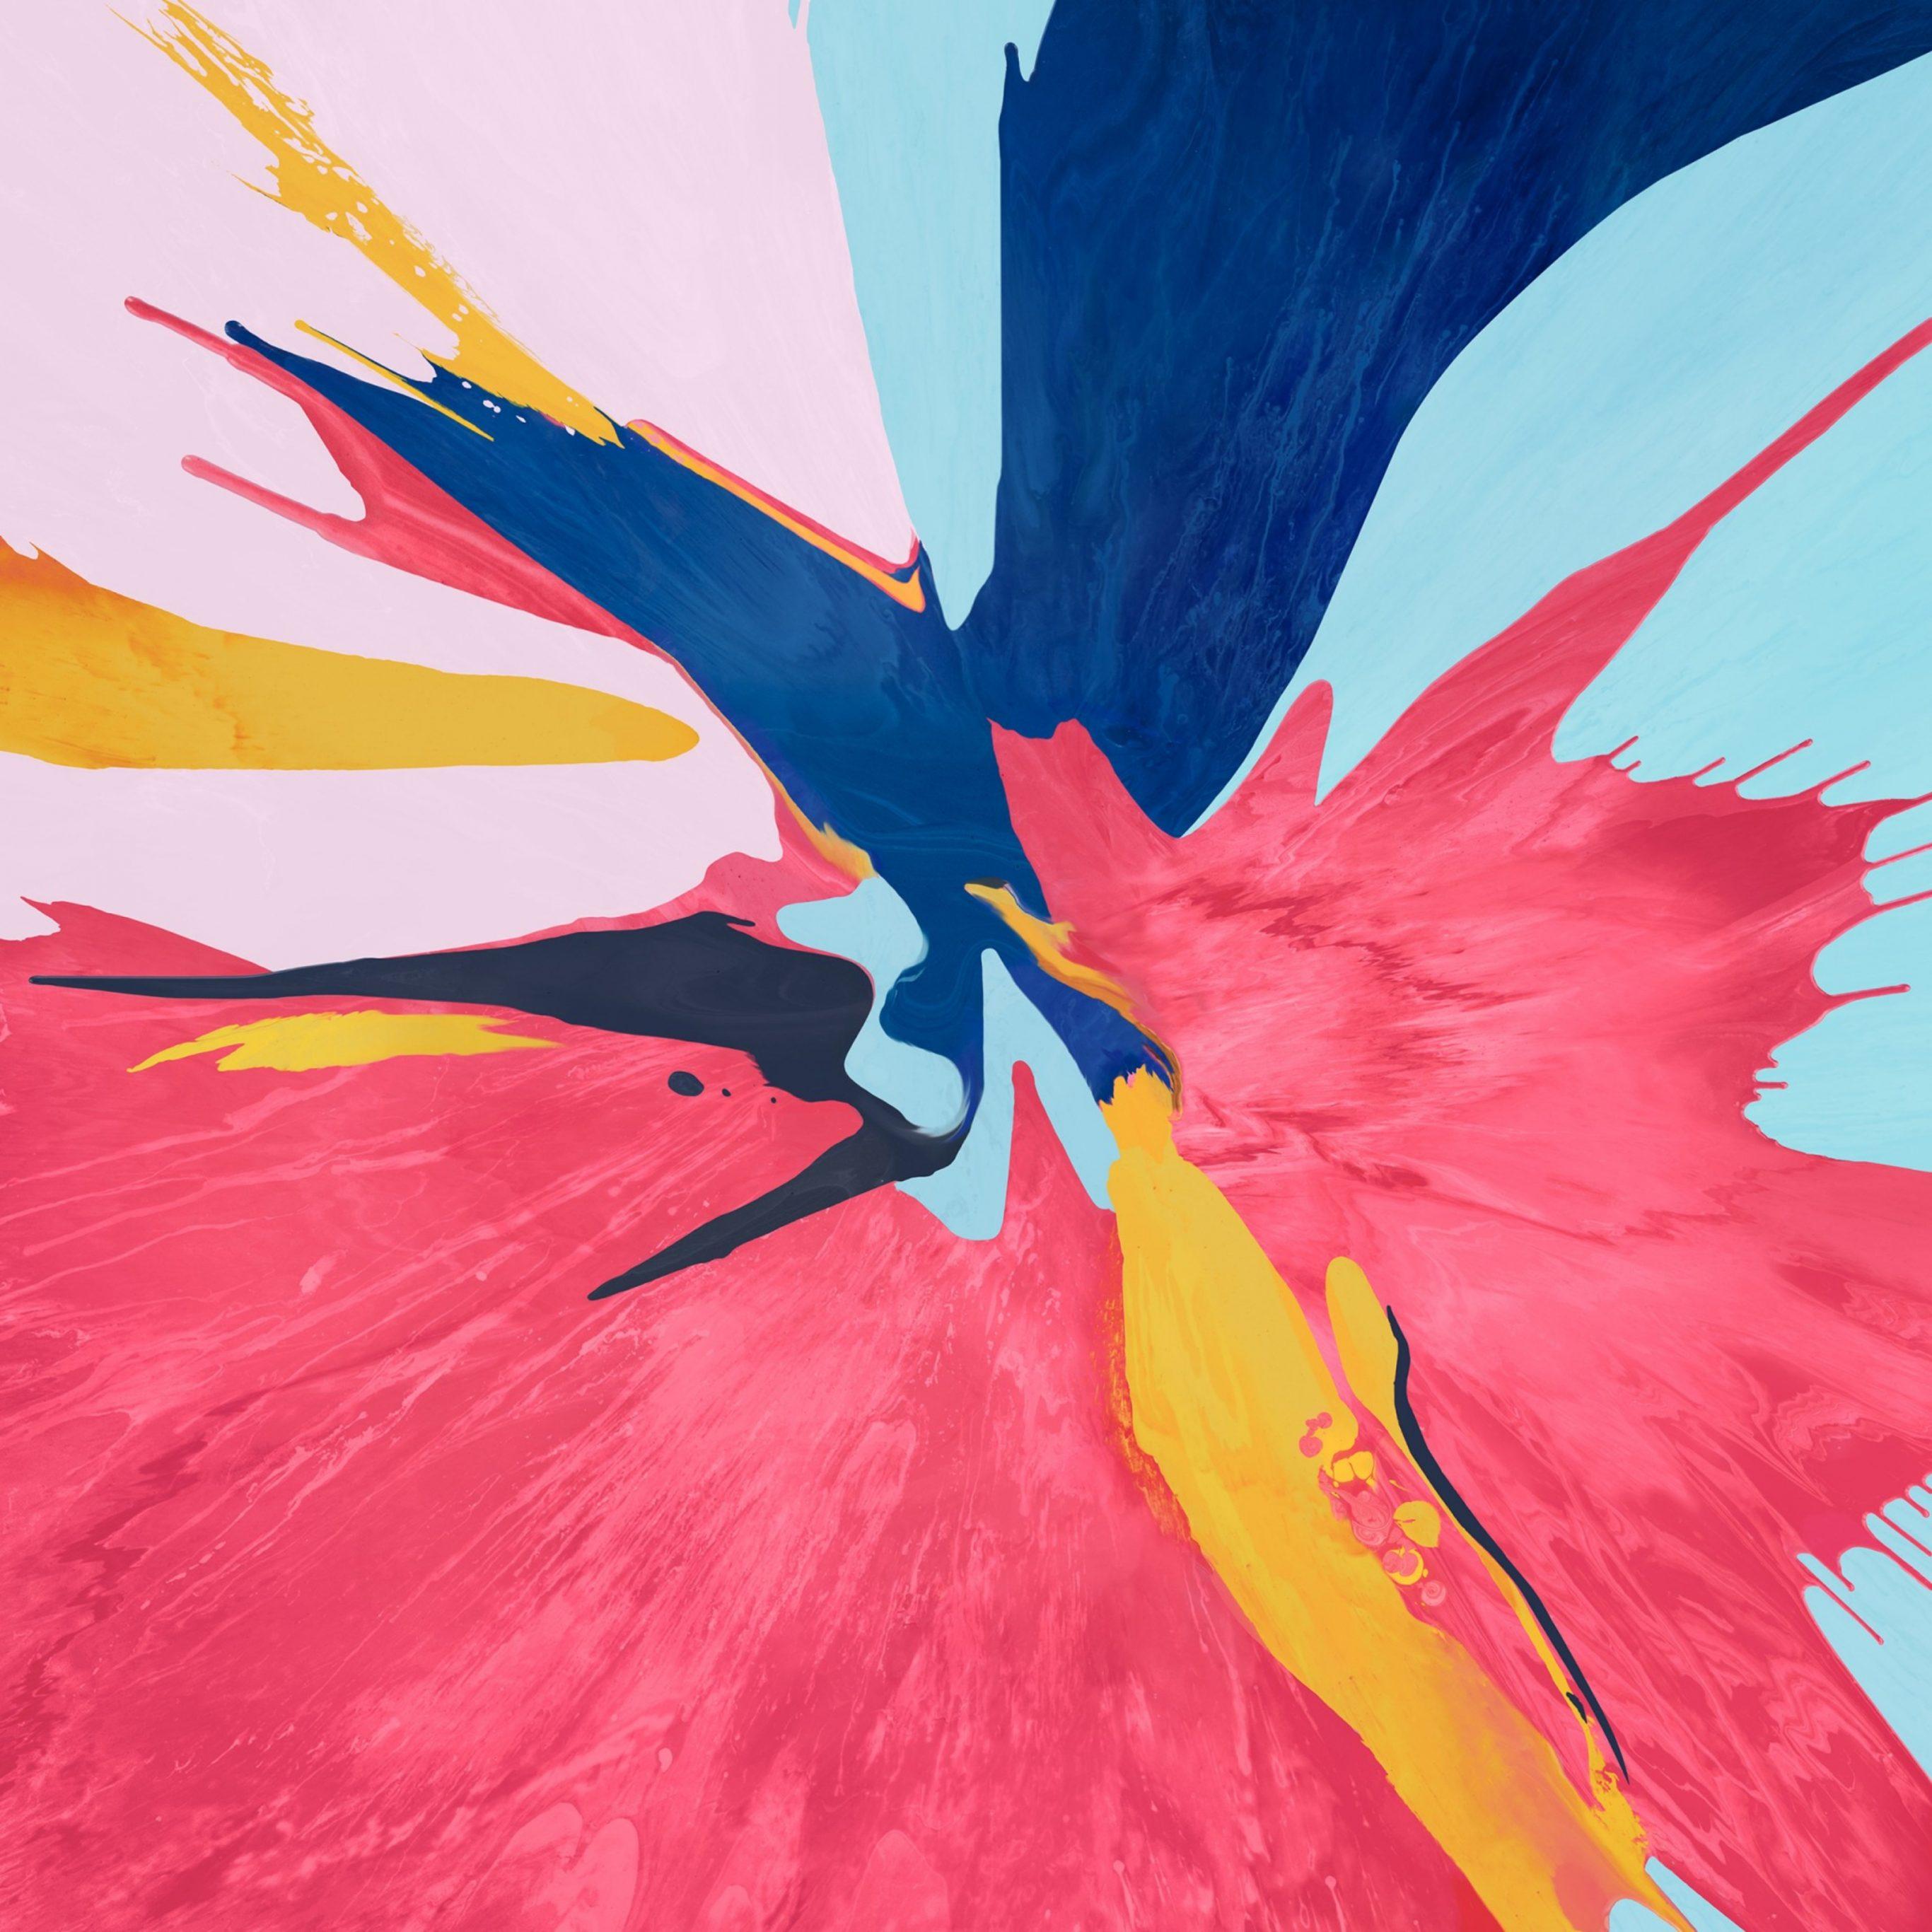 2732x2732 wallpapers 4k iPad Pro Spalsh Pink Yellow Blue Ipad Wallpaper 2732x2732 pixels resolution